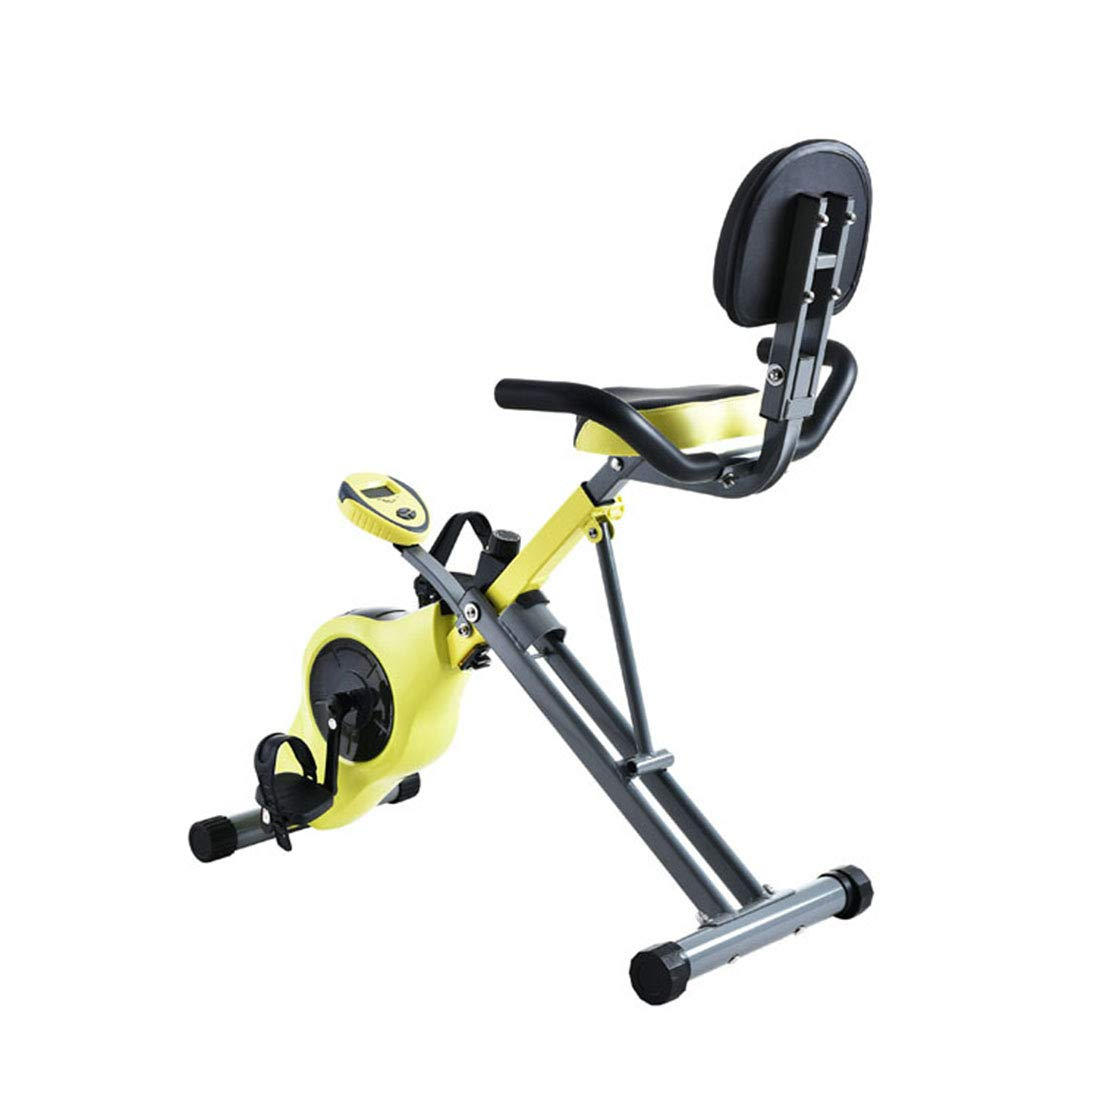 FELICIAAA ホームオフィスフィットネス折りたたみ磁気制御回転自転車多機能怠惰な車 (Color : イエロー)  イエロー B07NCLB3D6